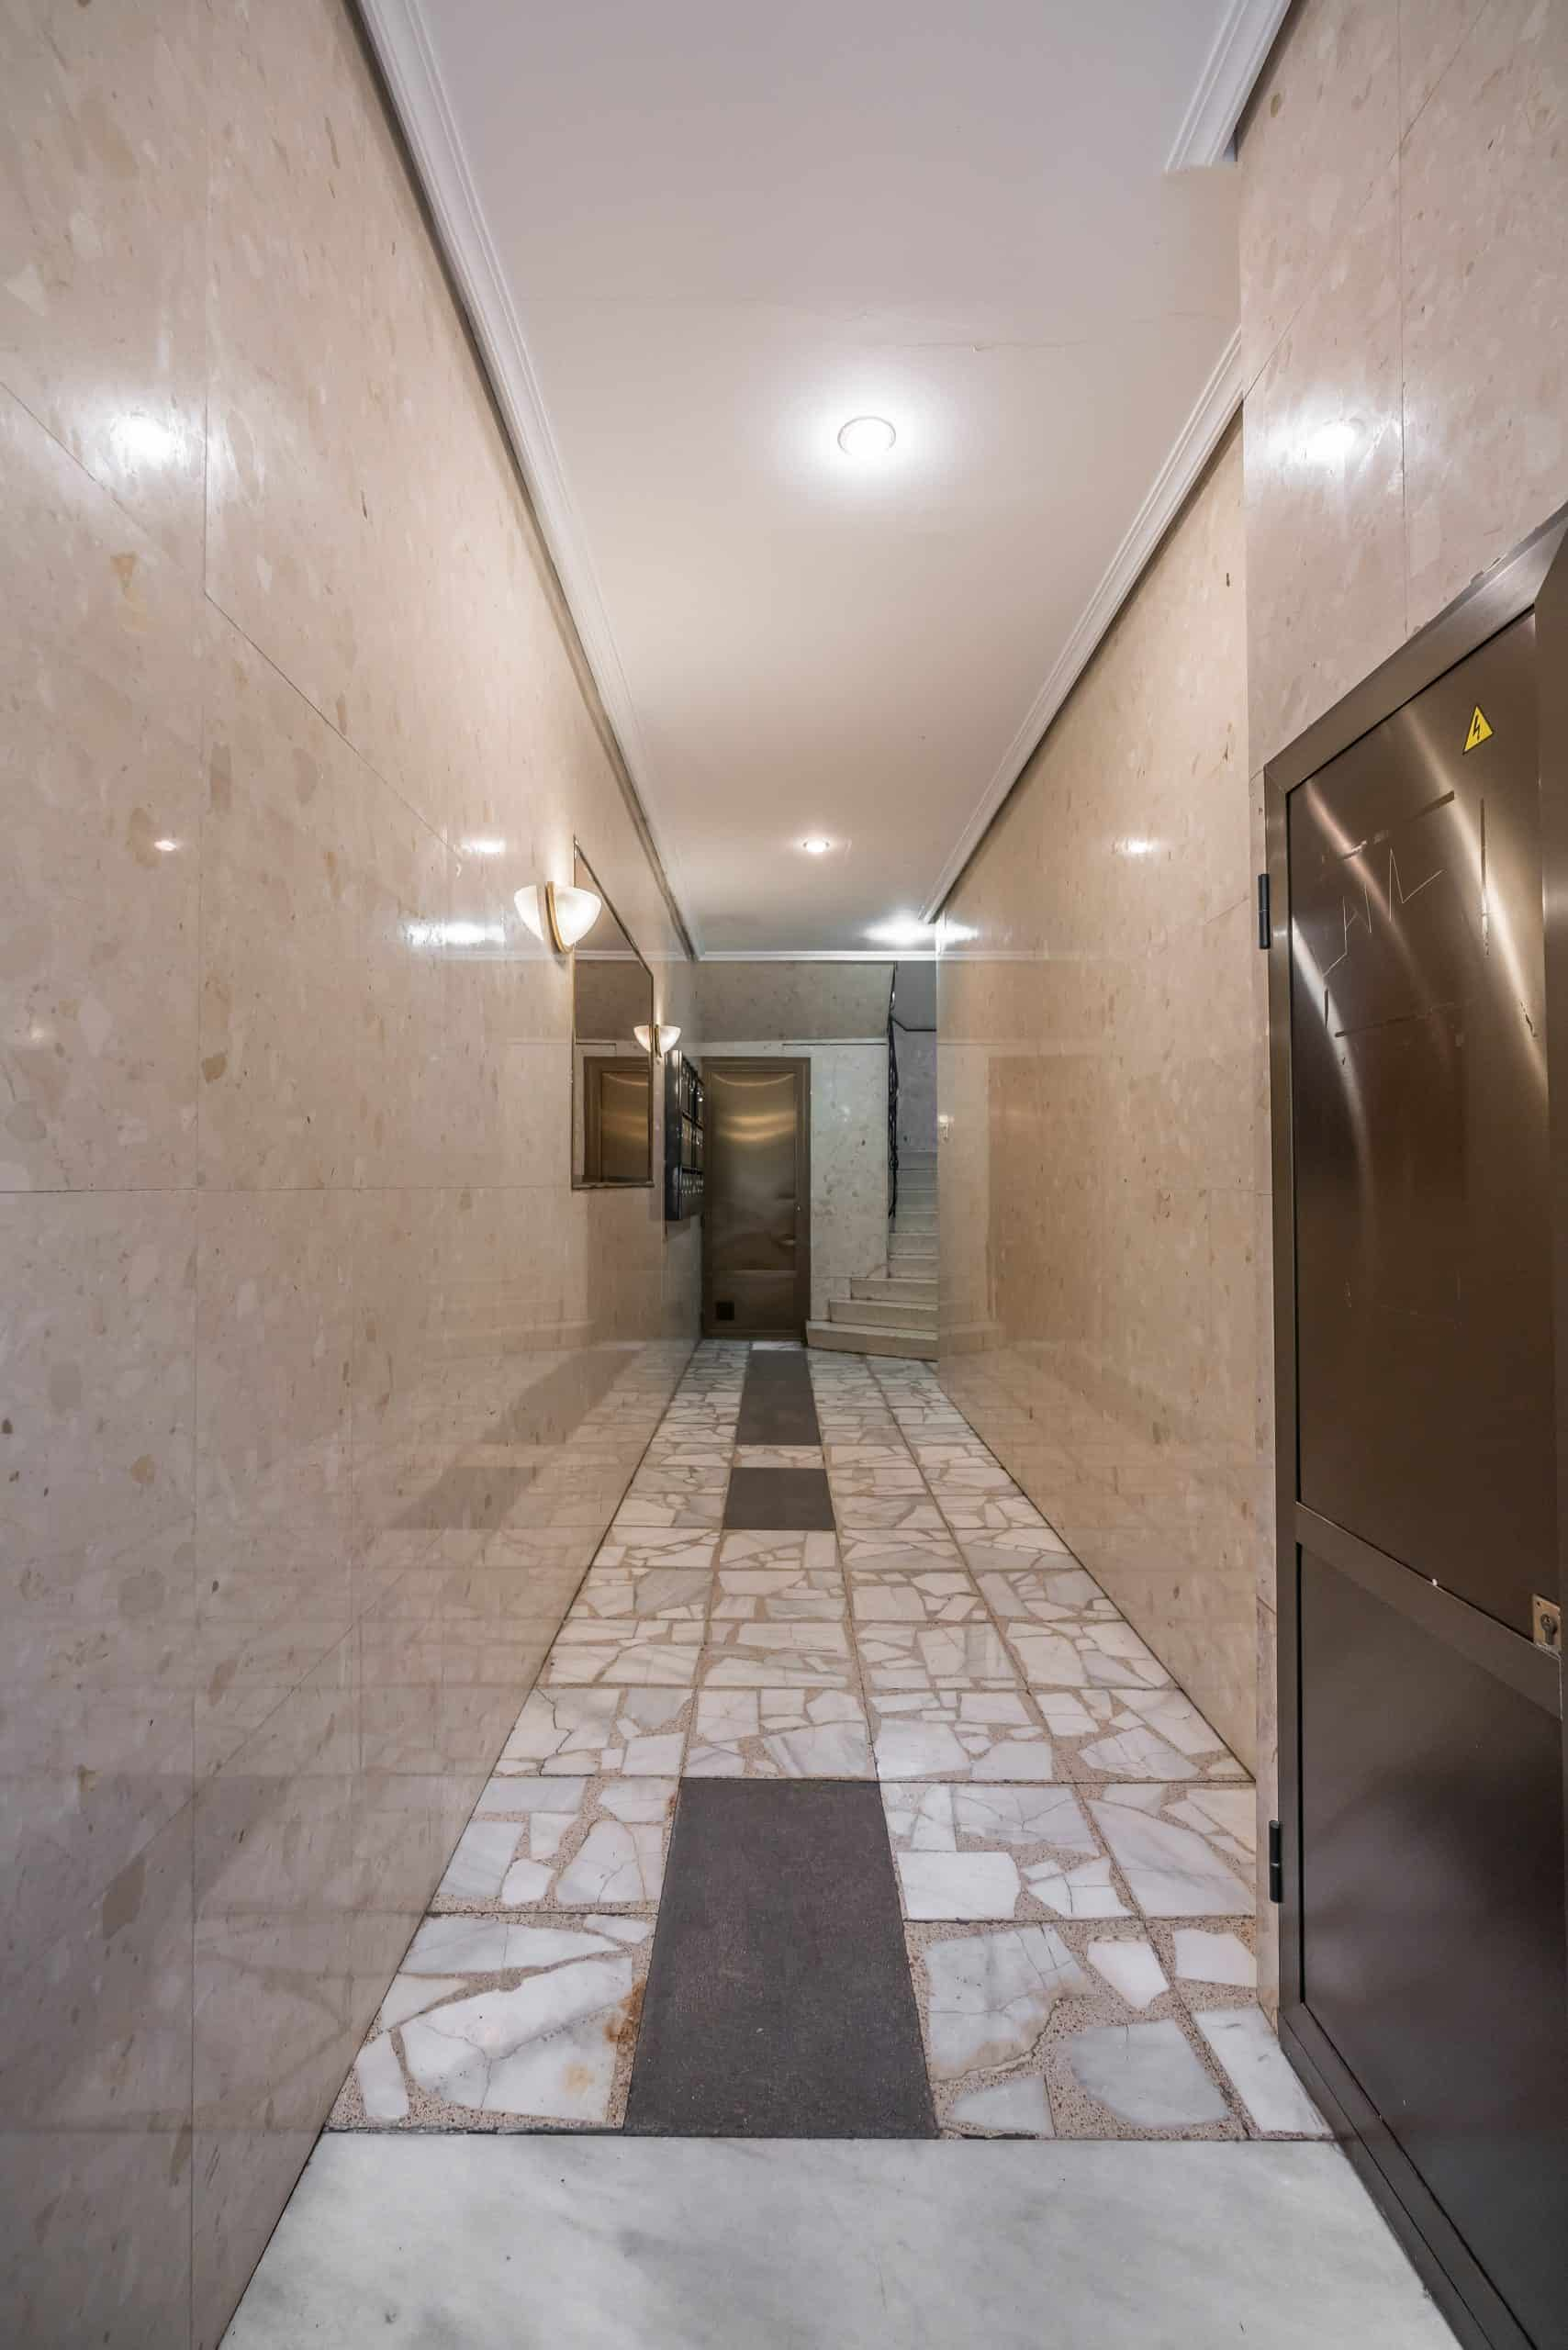 Agencia Inmobiliaria de Madrid-FUTUROCASA-Zona ARGANZUELA-EMBAJADORES-LEGAZPI8 ZONAS COMUNES (5)